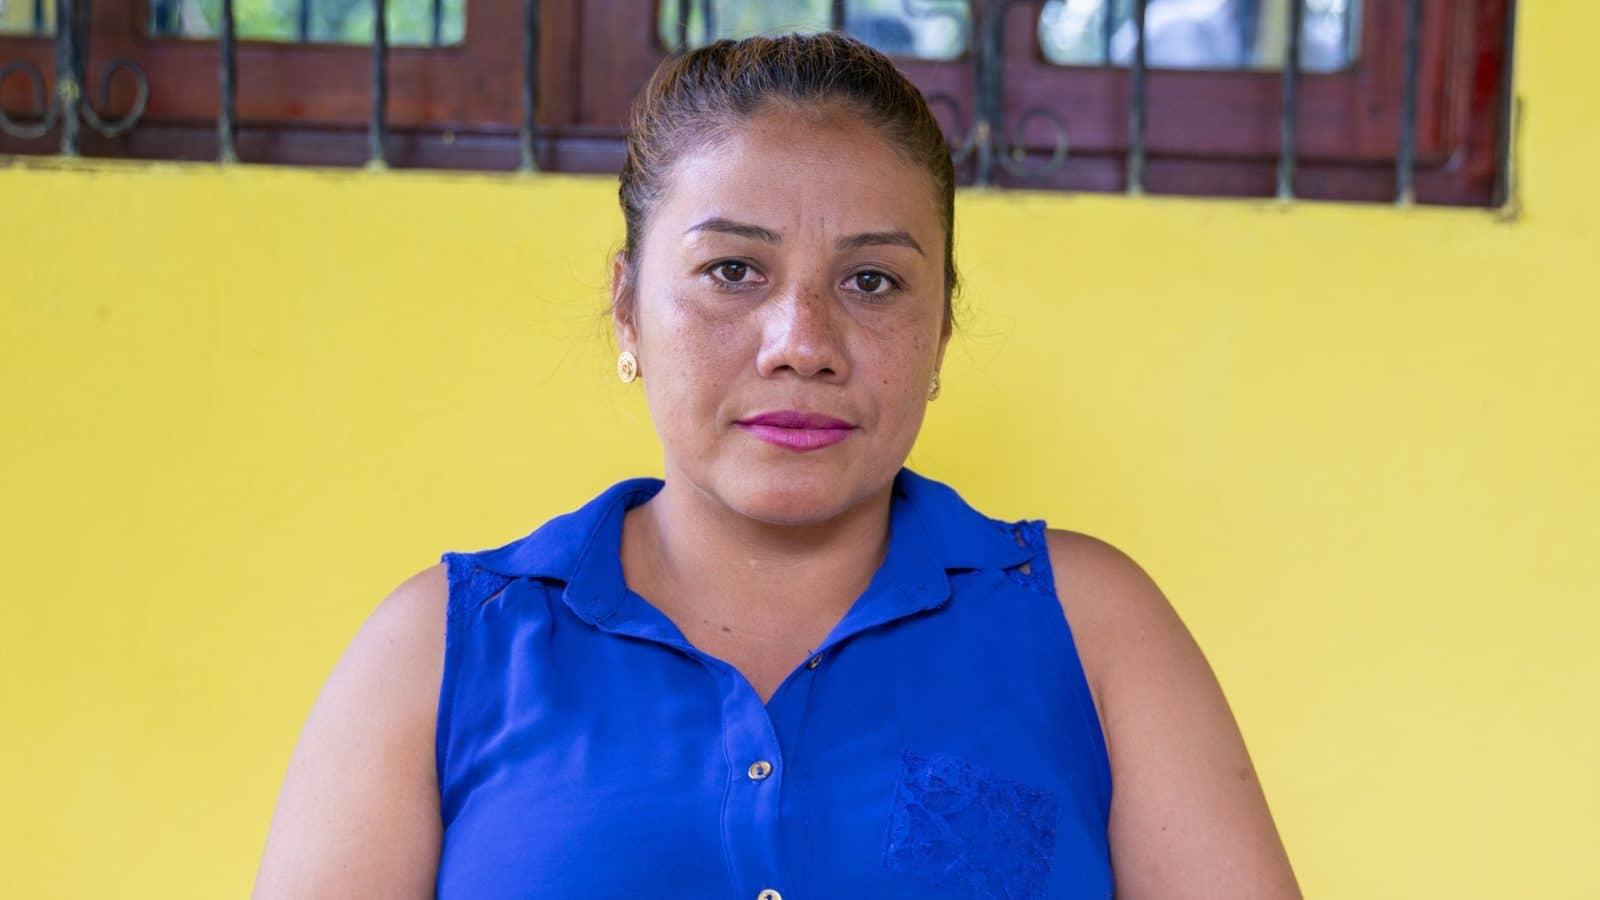 Cousin-Ruth-Aburto-Acevedo-Nicaragua-Grayzone-Ben-Norton